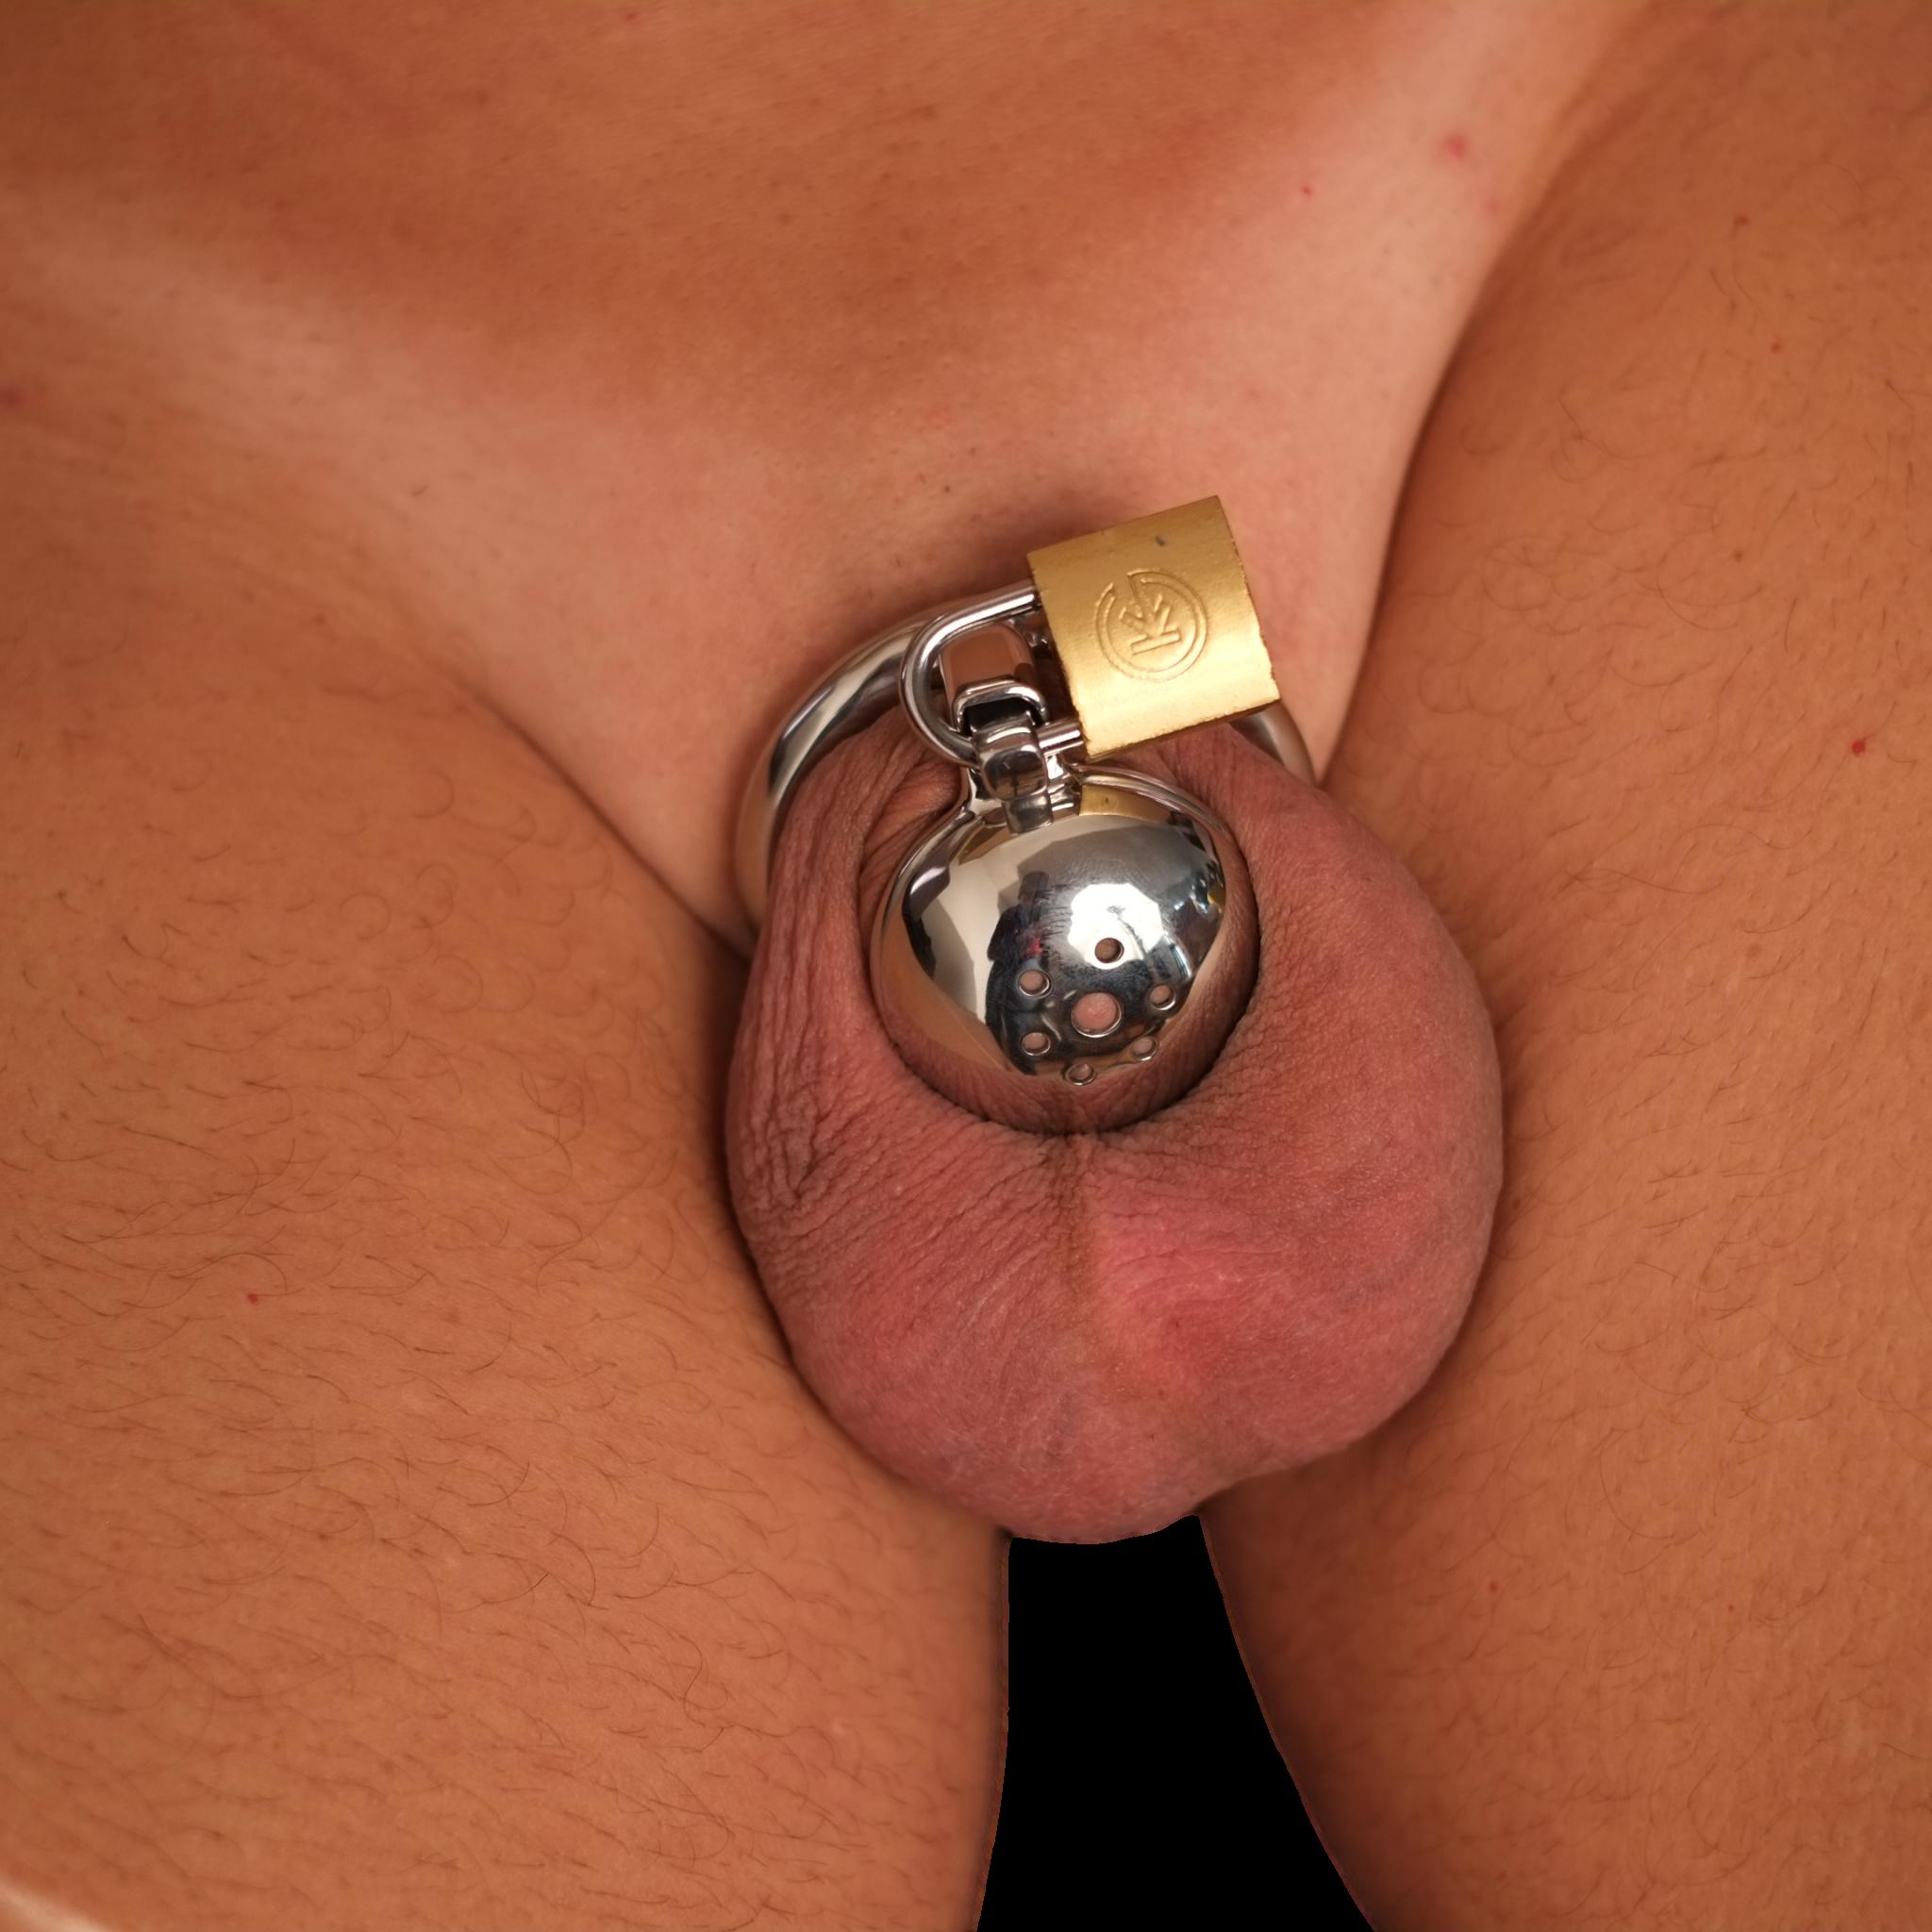 Male Chastity Bondage Lock Penis Cage Adult Sex